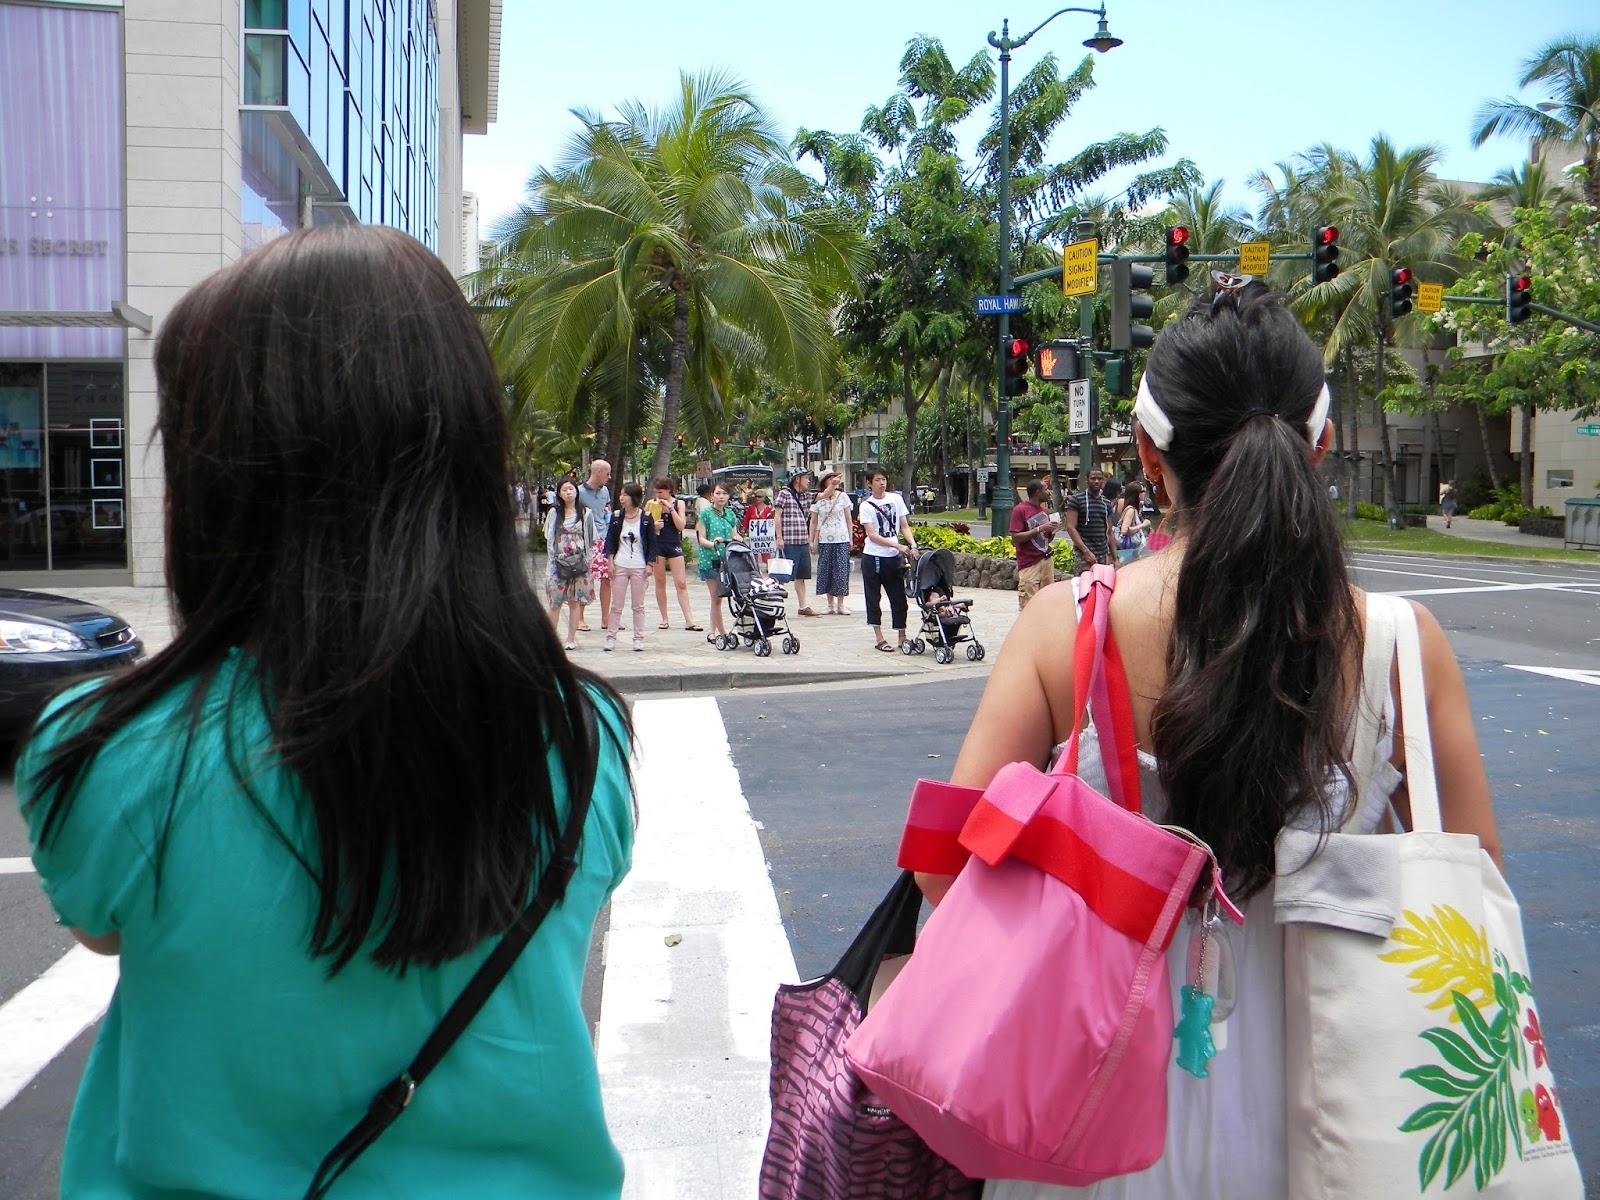 All Hawaii News: Hawaii tourism spending up 10%, tax hike